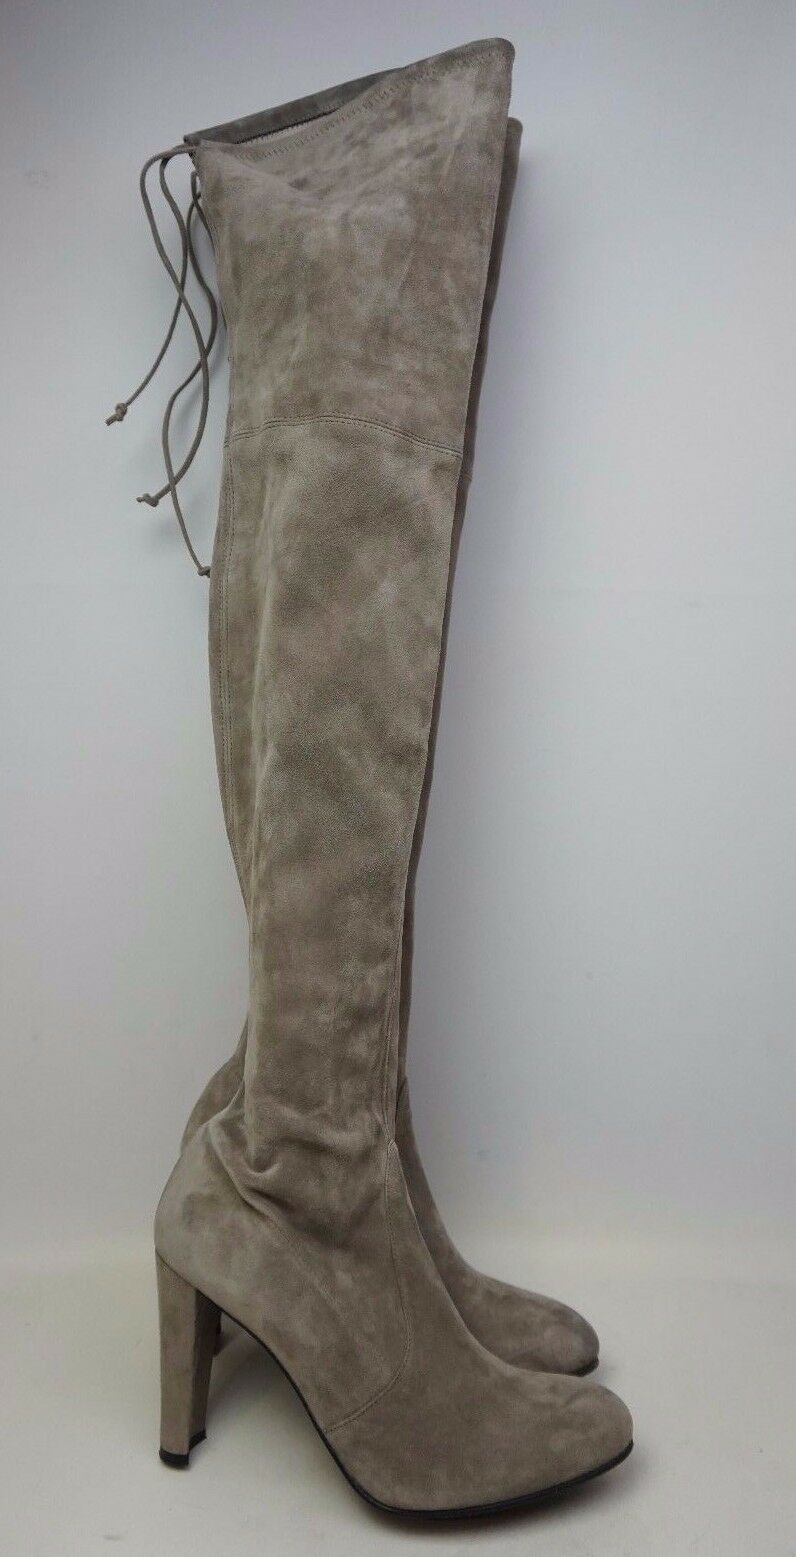 Stuart Weitzman Highland Over the Knee Praline Grey Suede Boots Size 11 M